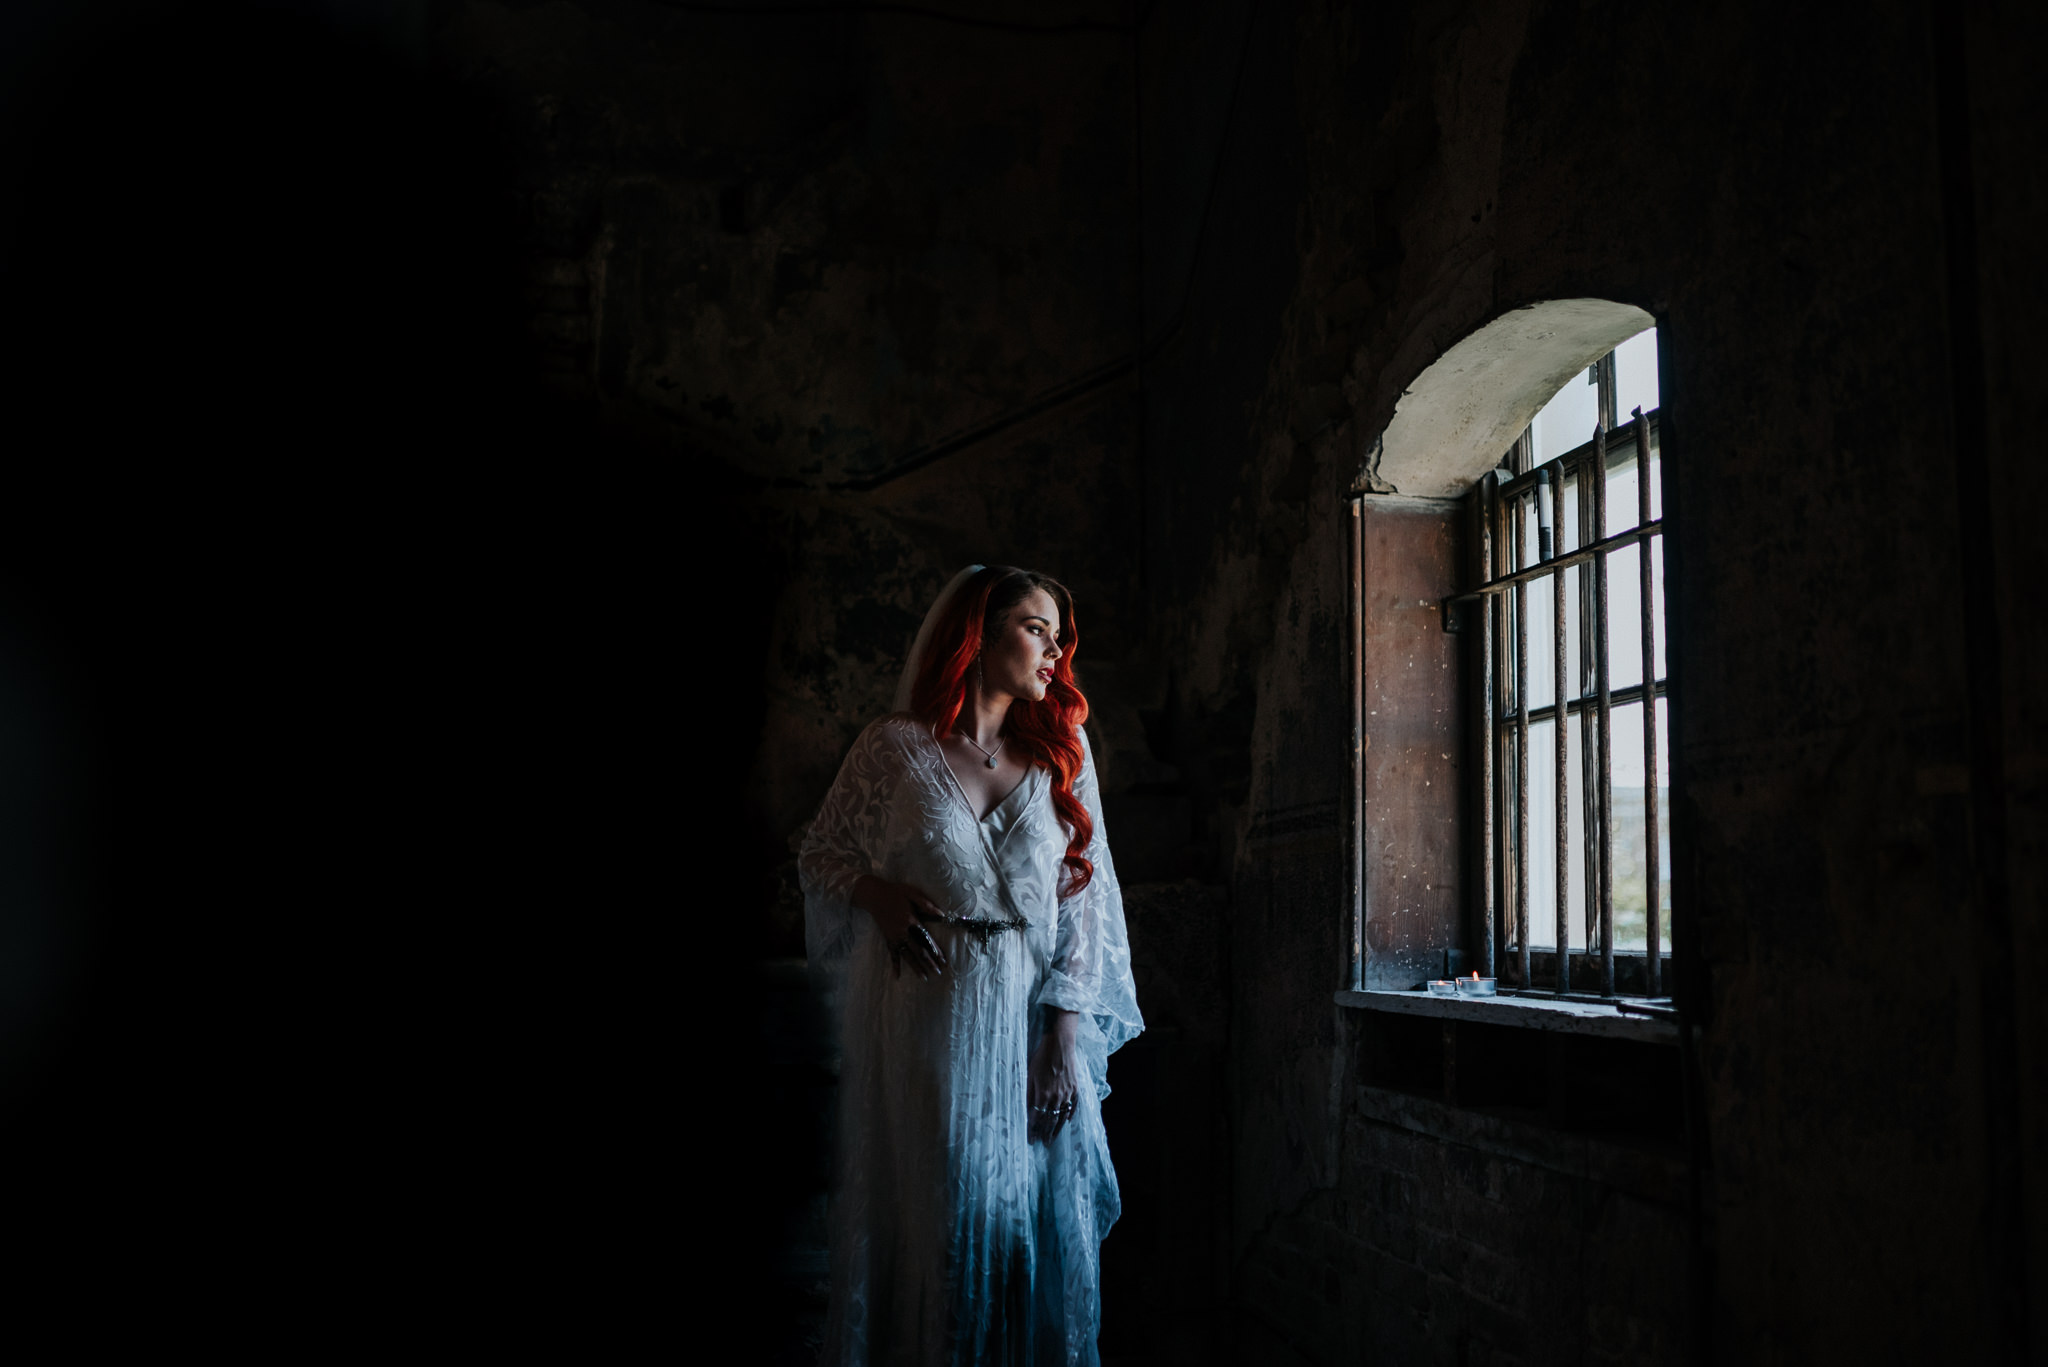 alternative chapel wedding- asylum london- unique london wedding venue- london wedding venue- Jenny Appleton Photography- bride looking out of window- gothic wedding venue